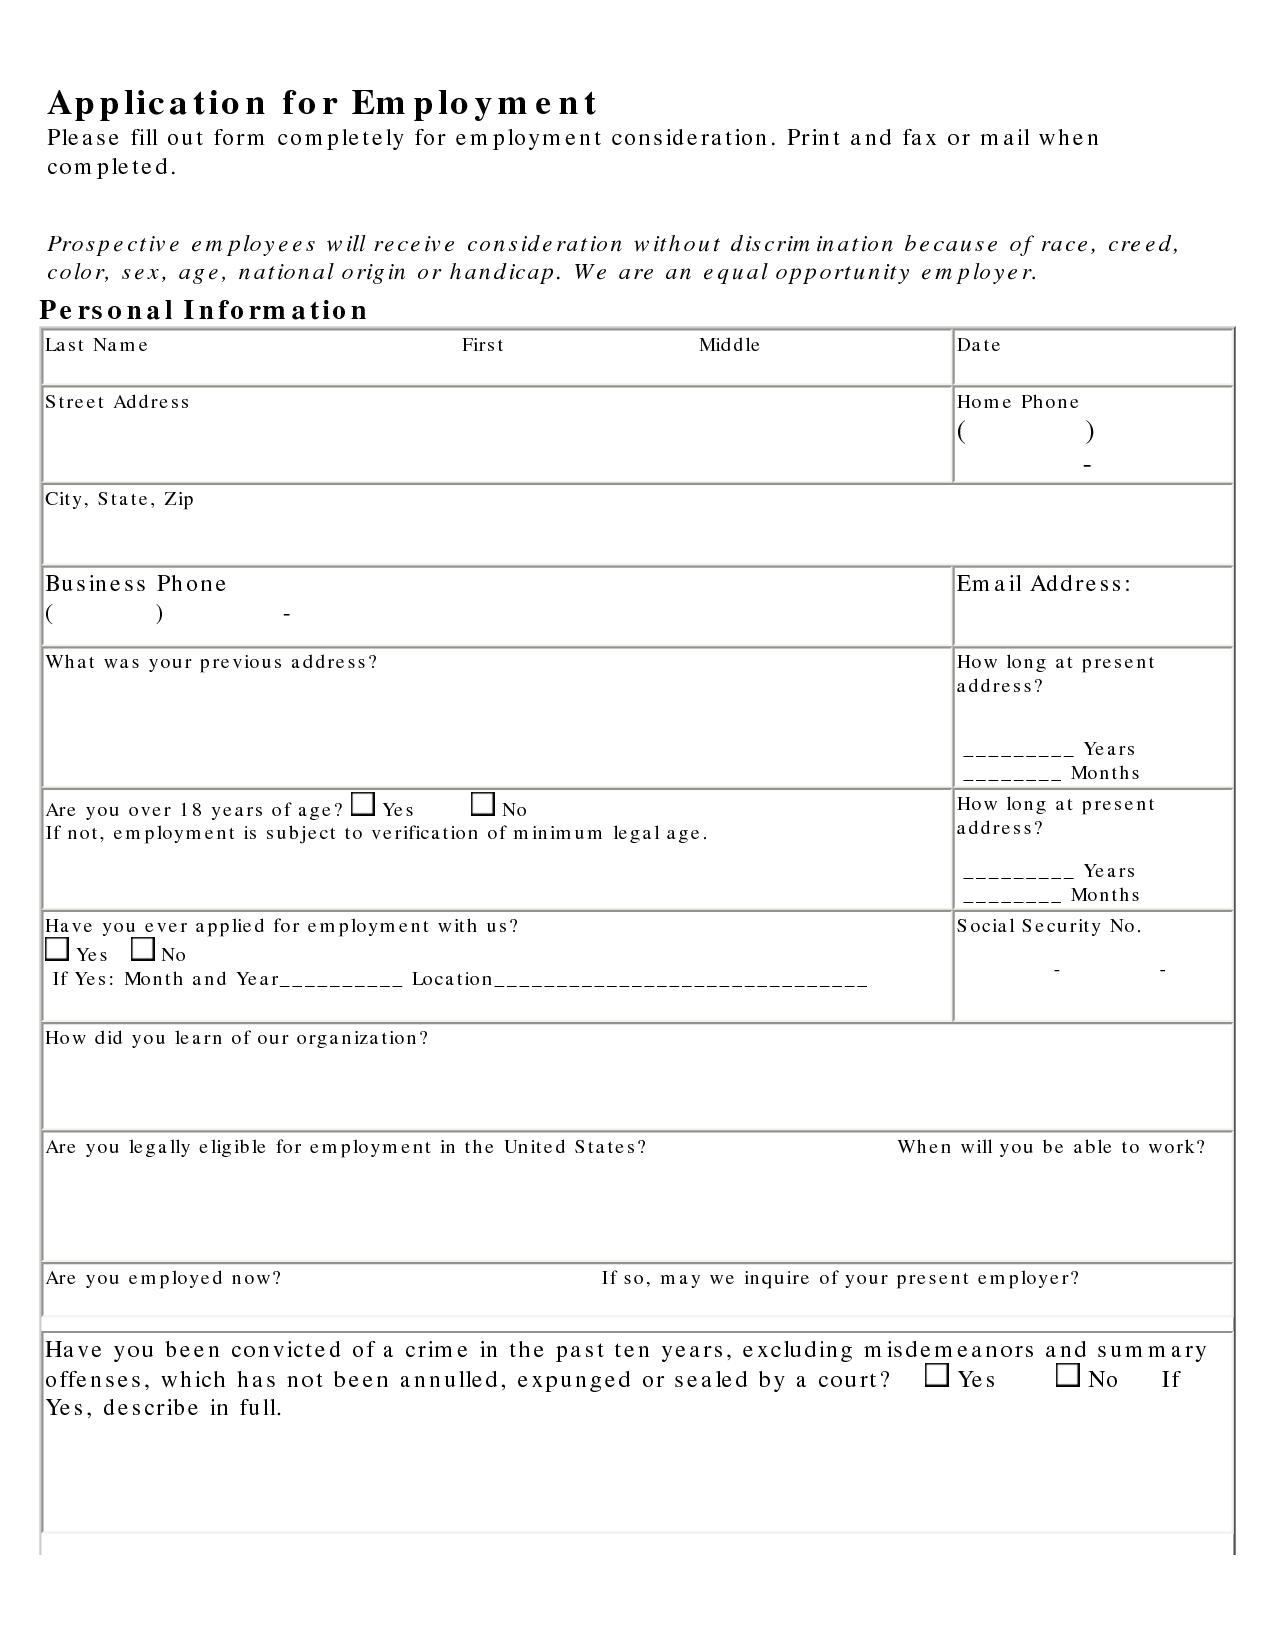 Job Application Practice Job Application Form Sample About Careers Job Application Printable